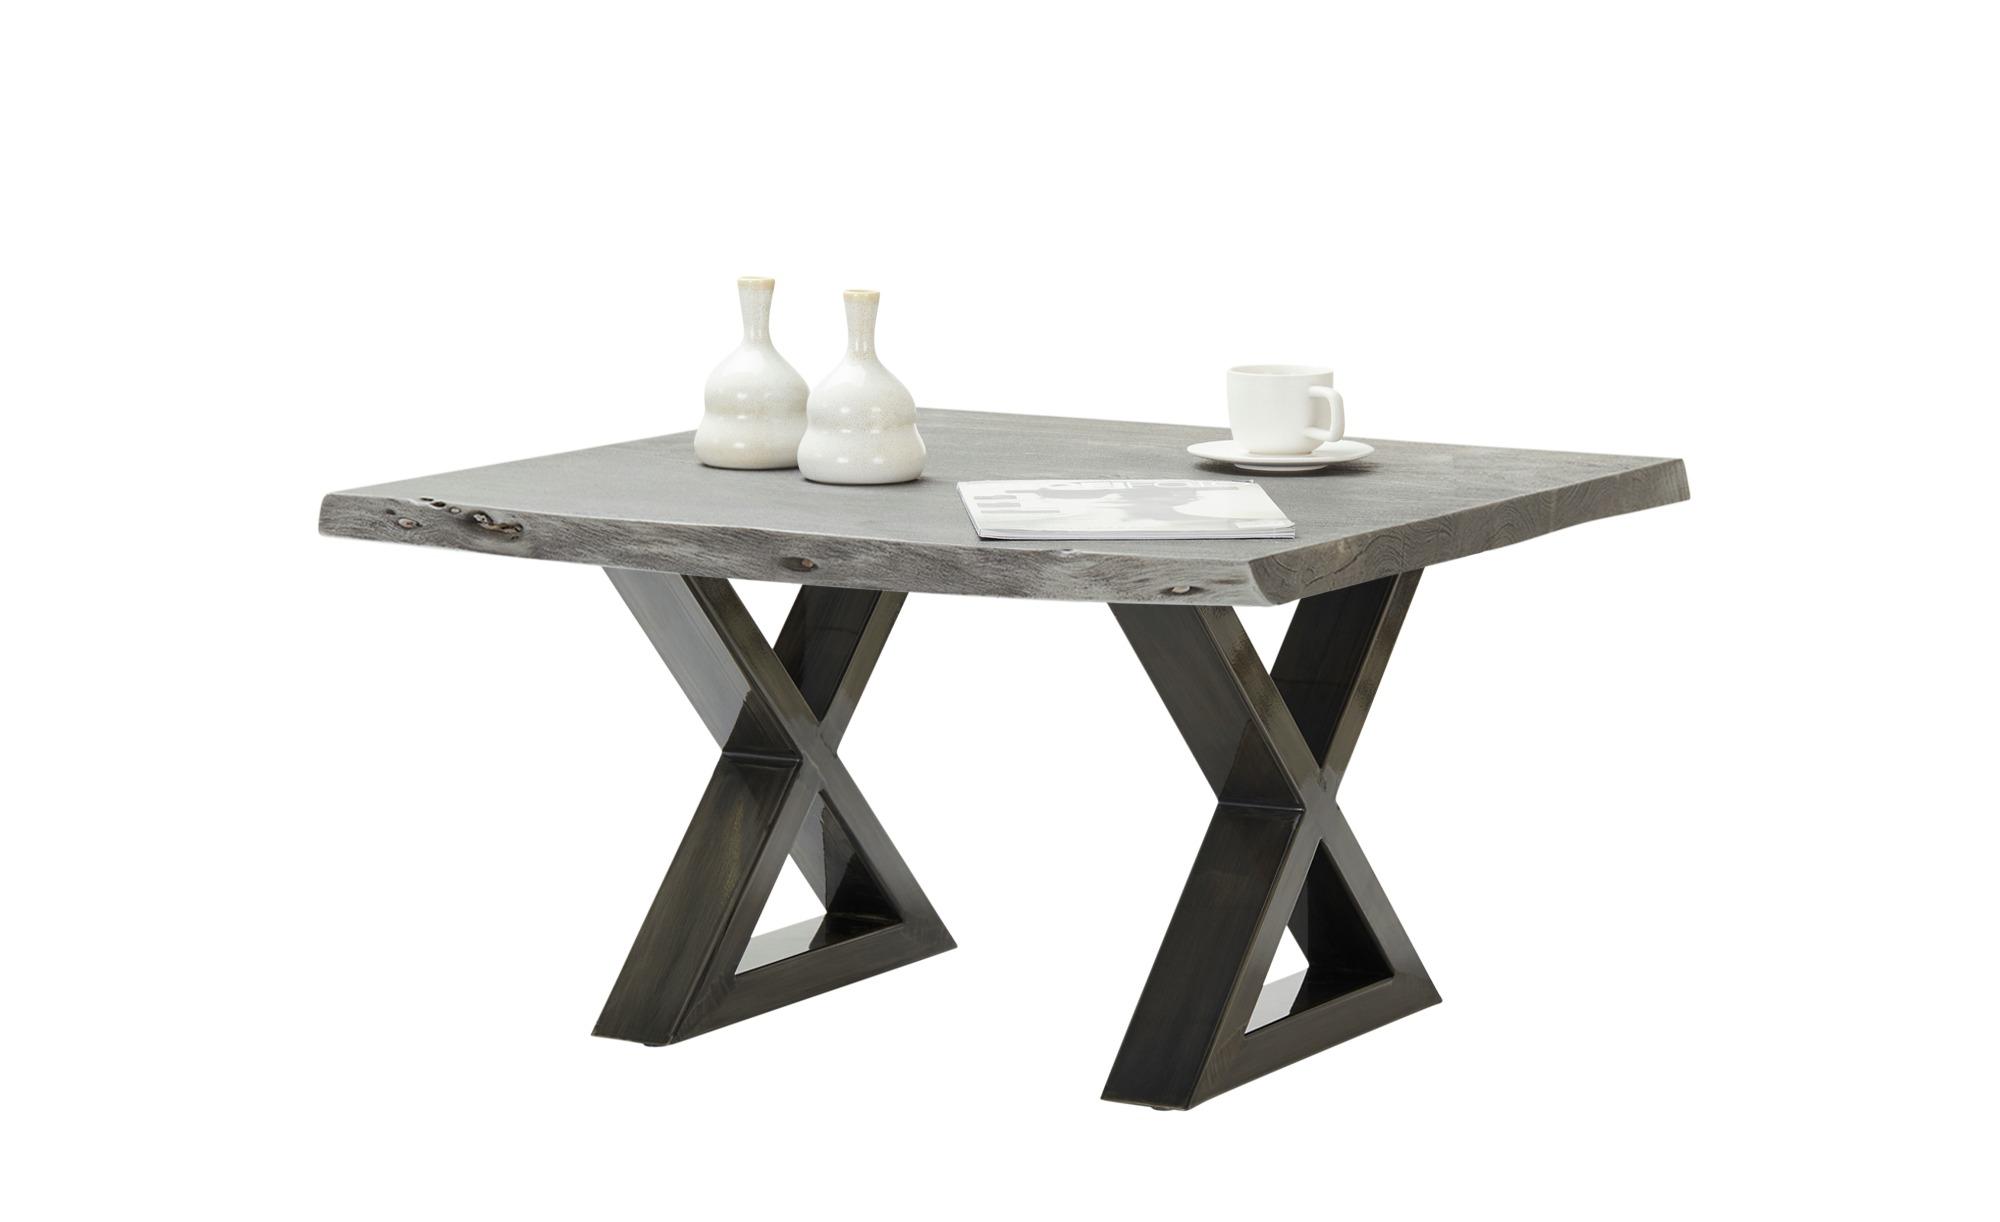 Woodford Couchtisch  Alabria ¦ grau ¦ Maße (cm): B: 75 H: 45 Tische > Couchtische > Couchtisch Massivholz - Höffner